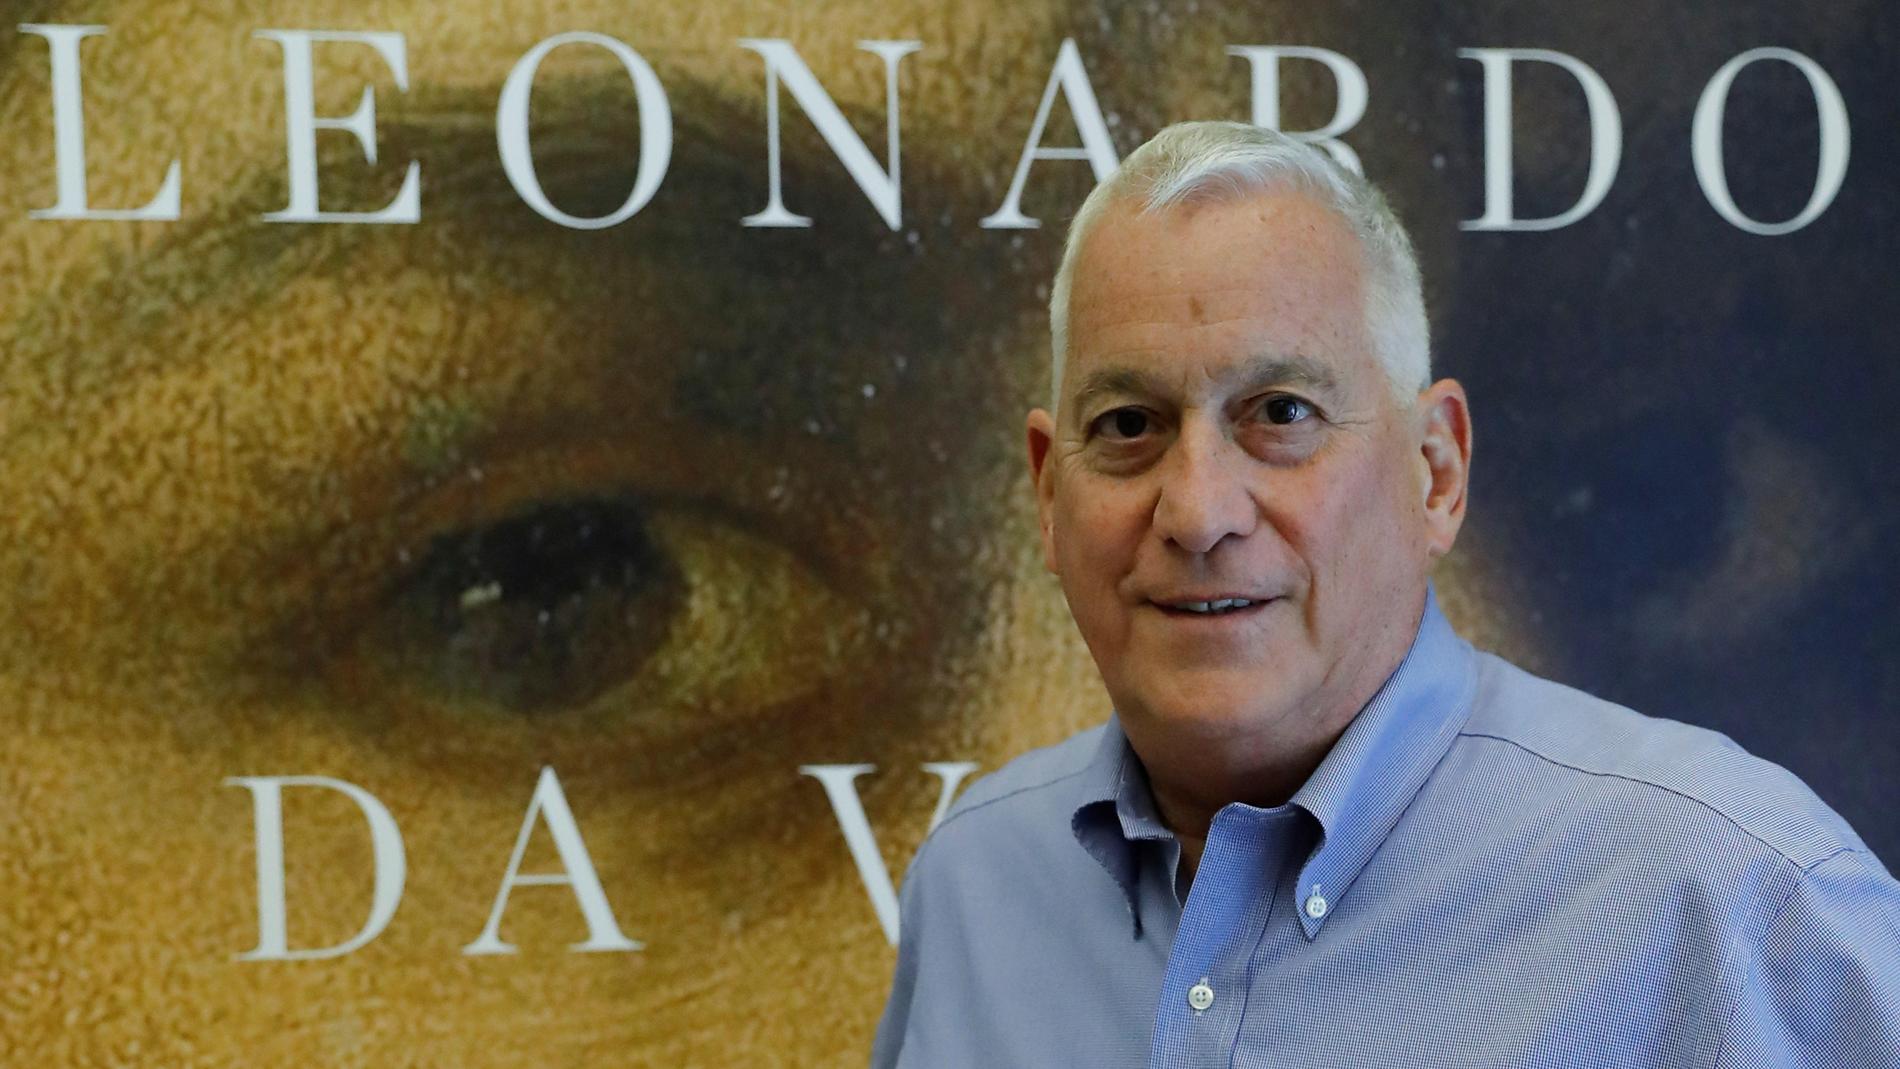 Leonardo Da Vinci Visto Por Walter Isaacson El Biógrafo Que Desentrañó A Einstein Y Steve Jobs Rtve Es